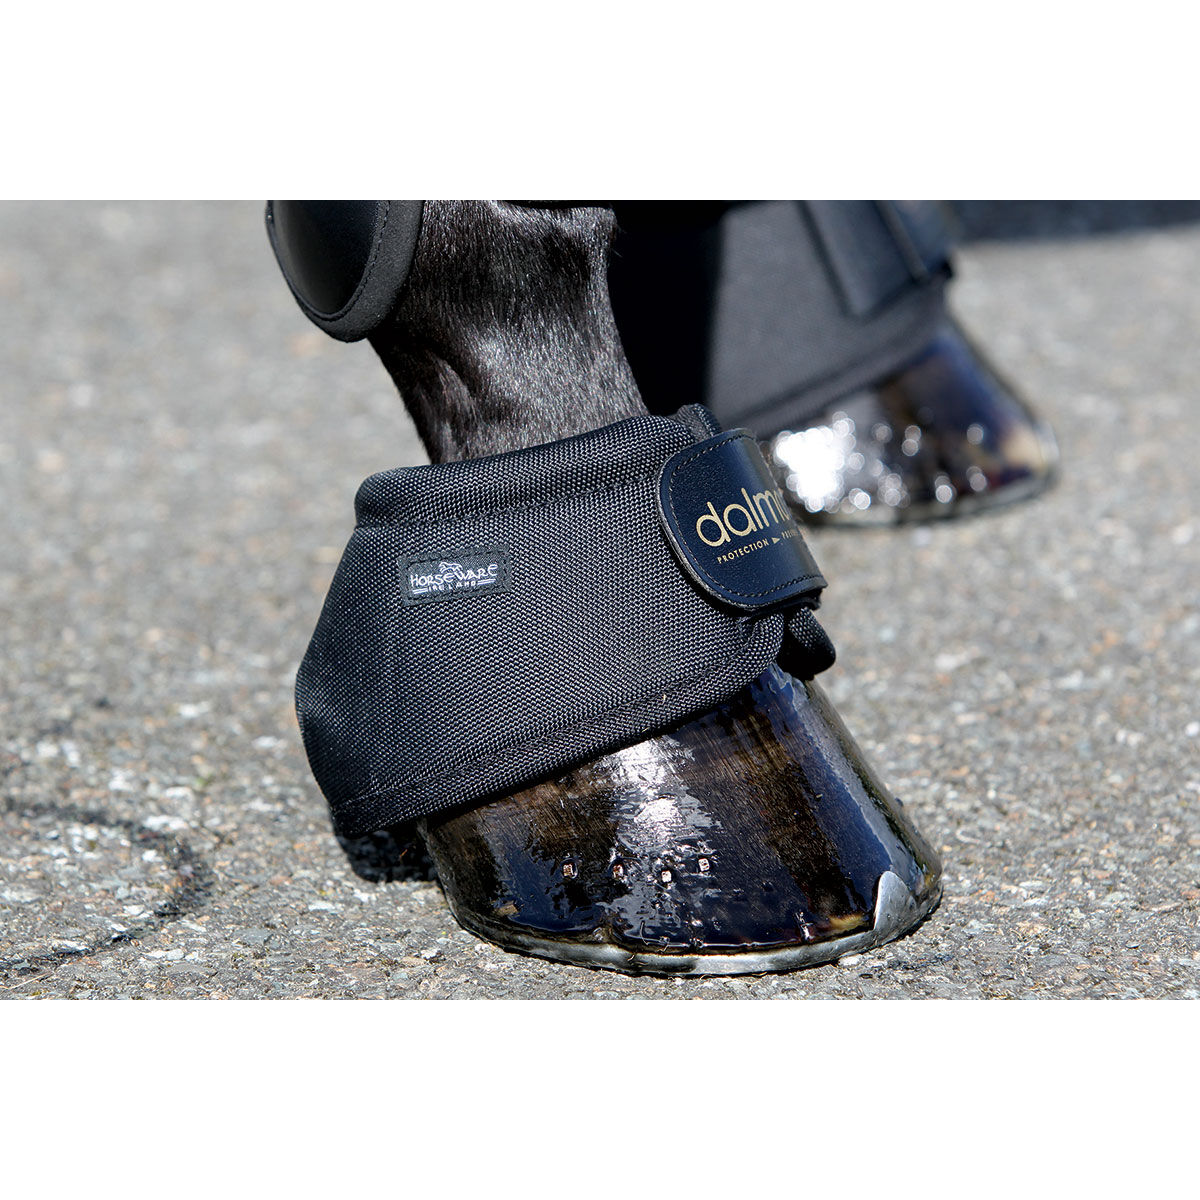 Horse Cob Horseware Rambo Fly Boots Vamoose Gamaschen Silver//Purple Pony